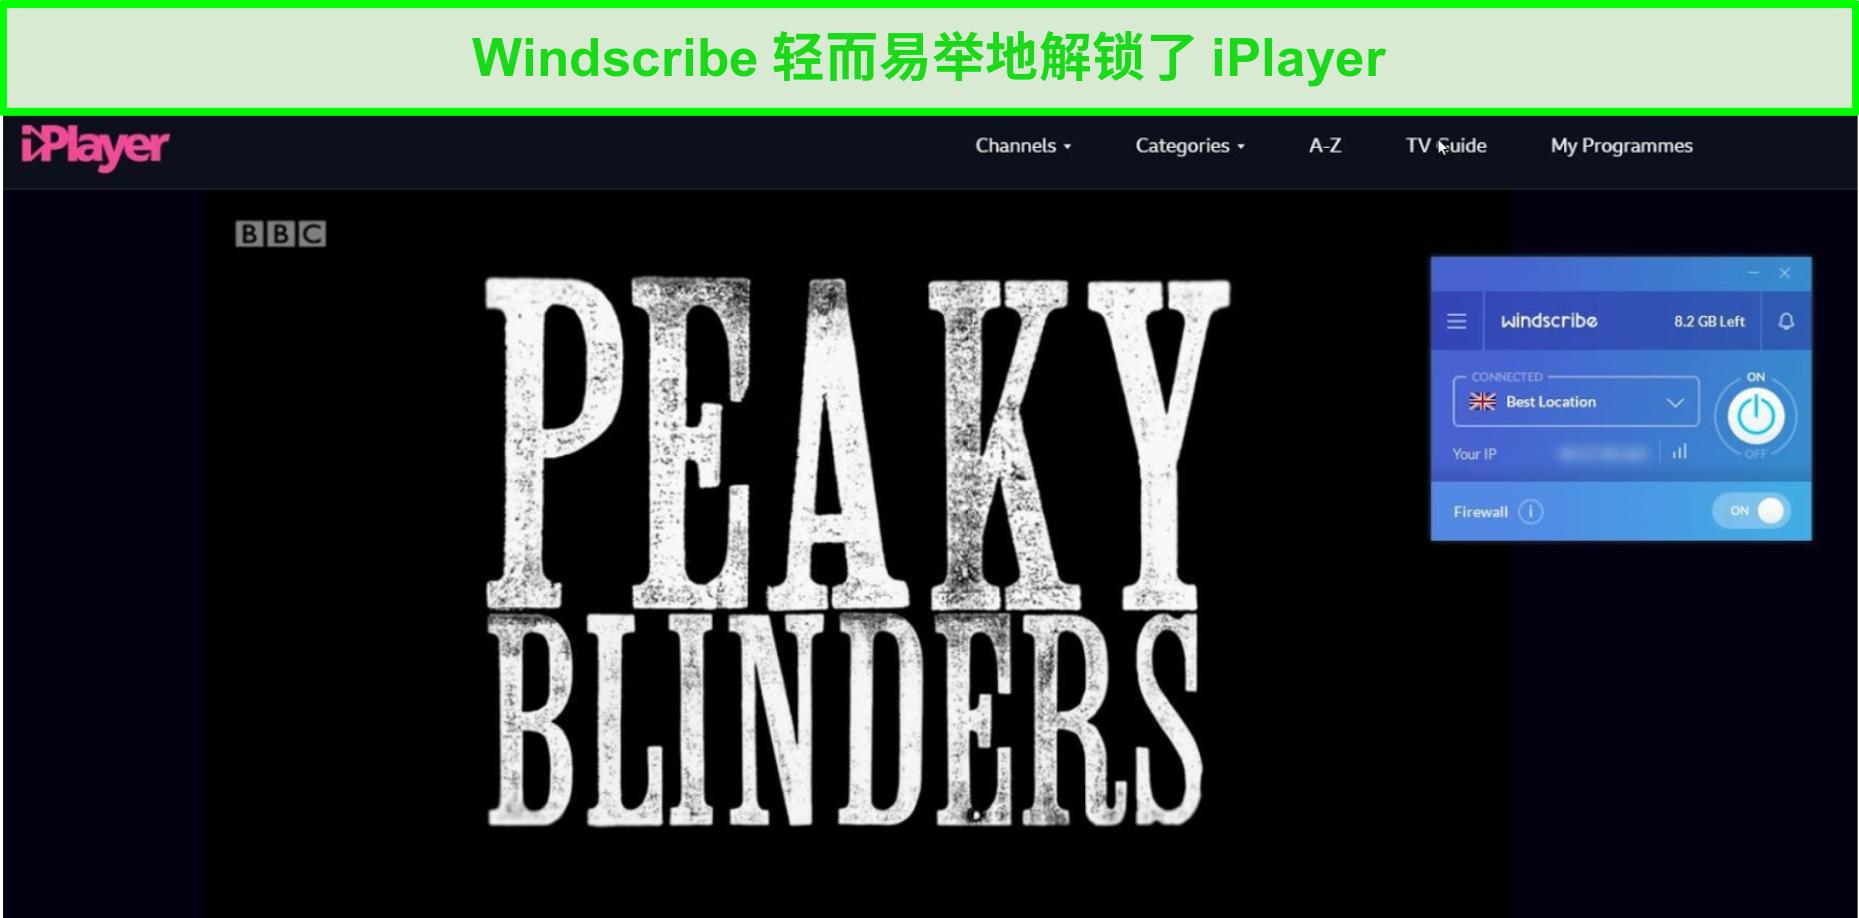 Windscribe works with BBC iPlayer